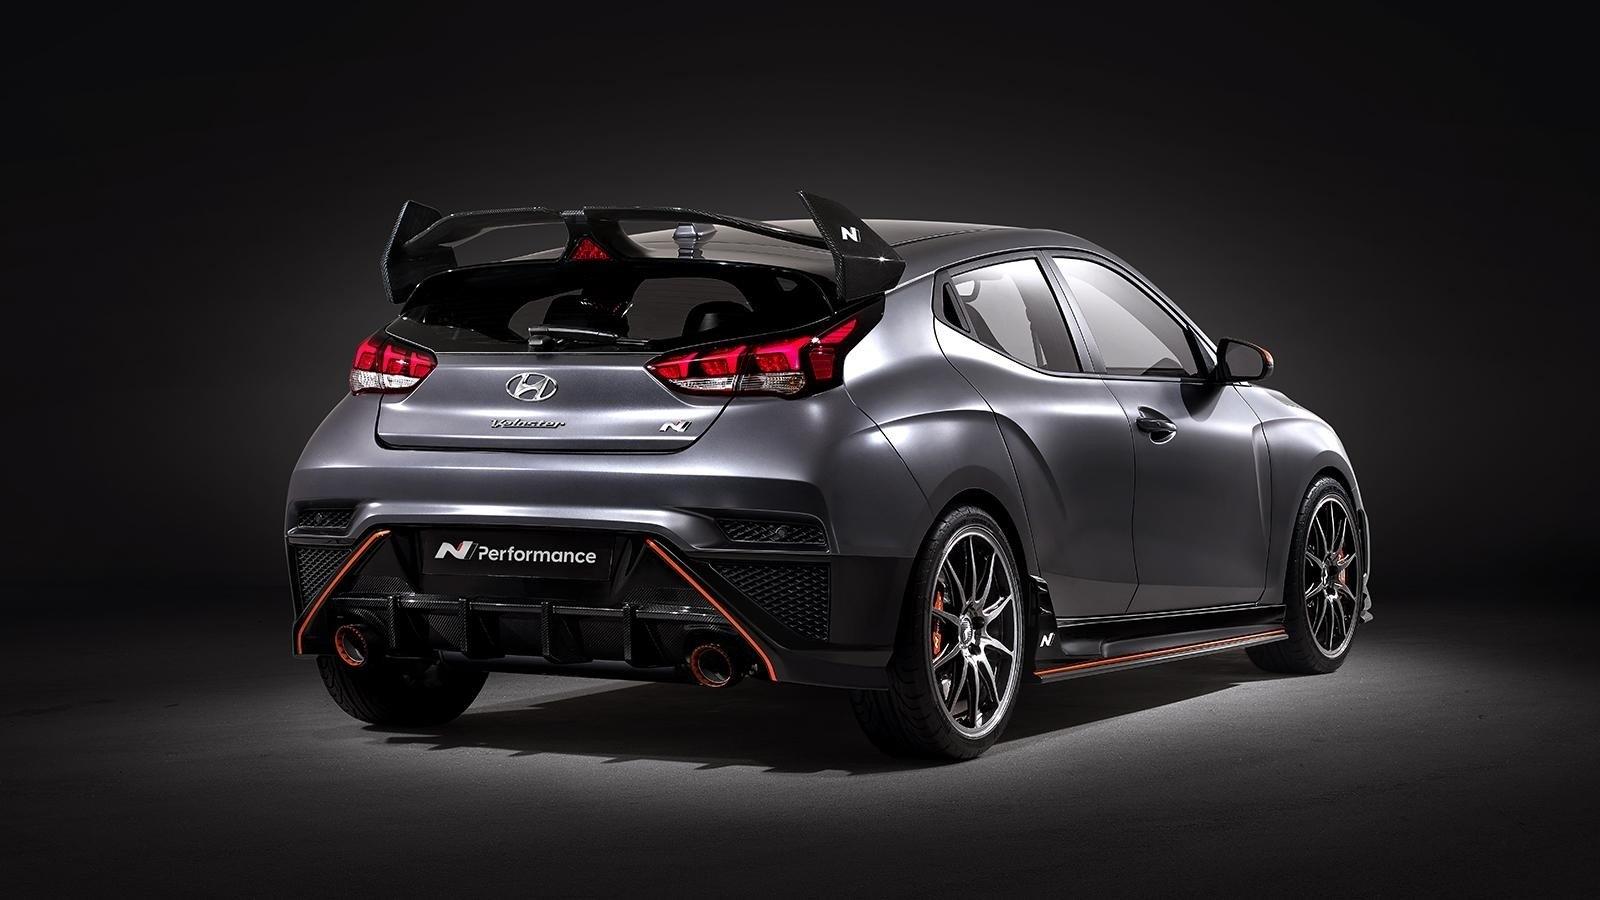 Hyundai Veloster N Performance Concept (2)